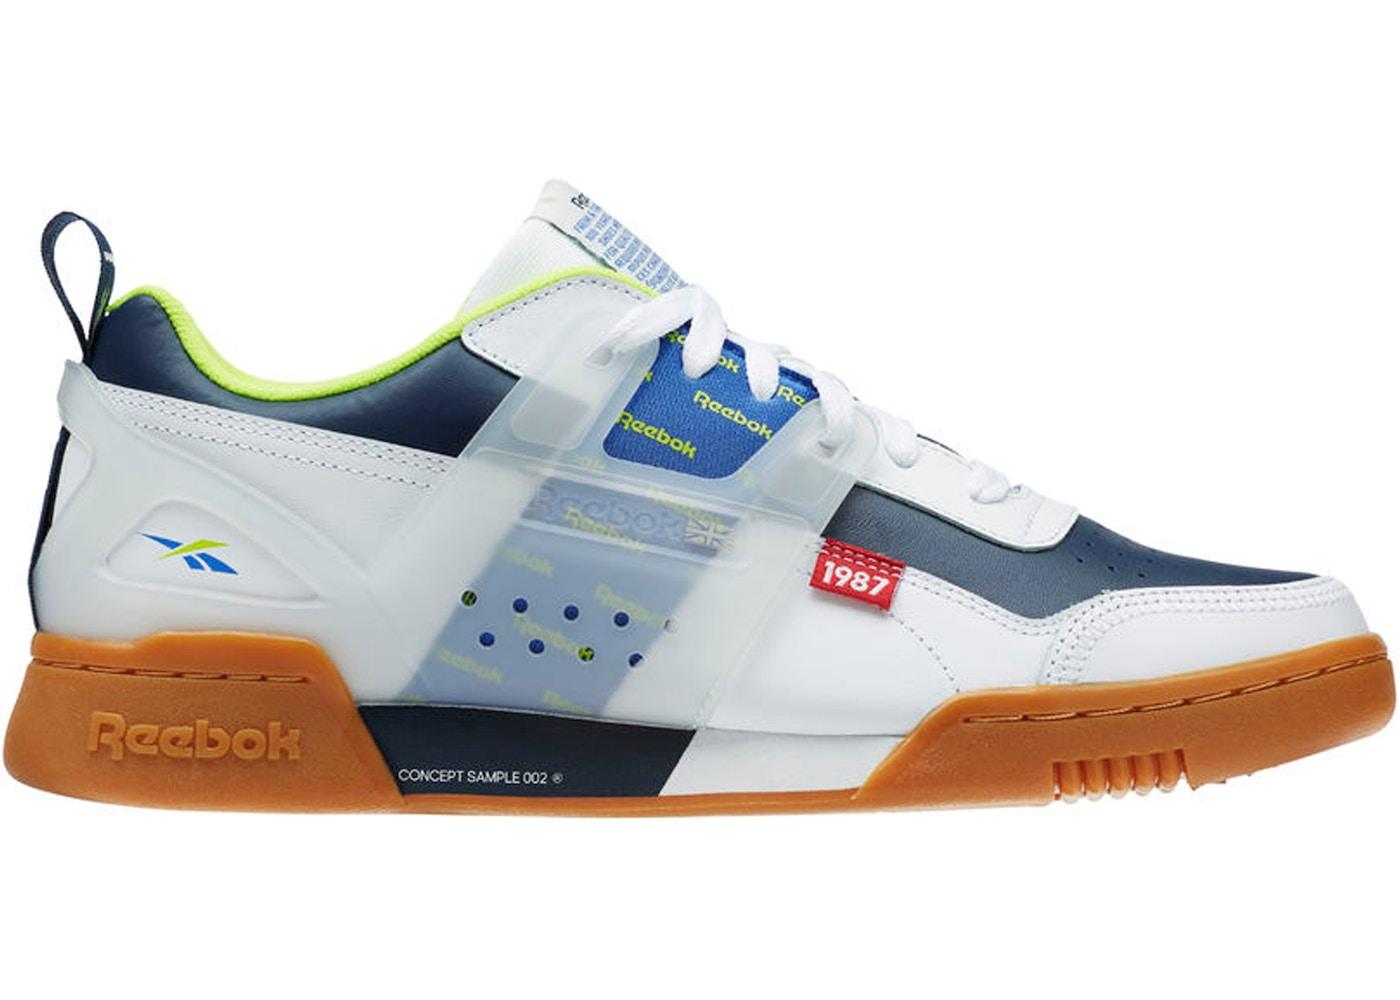 9df8f72daf80 Reebok Size 15 Shoes - Release Date